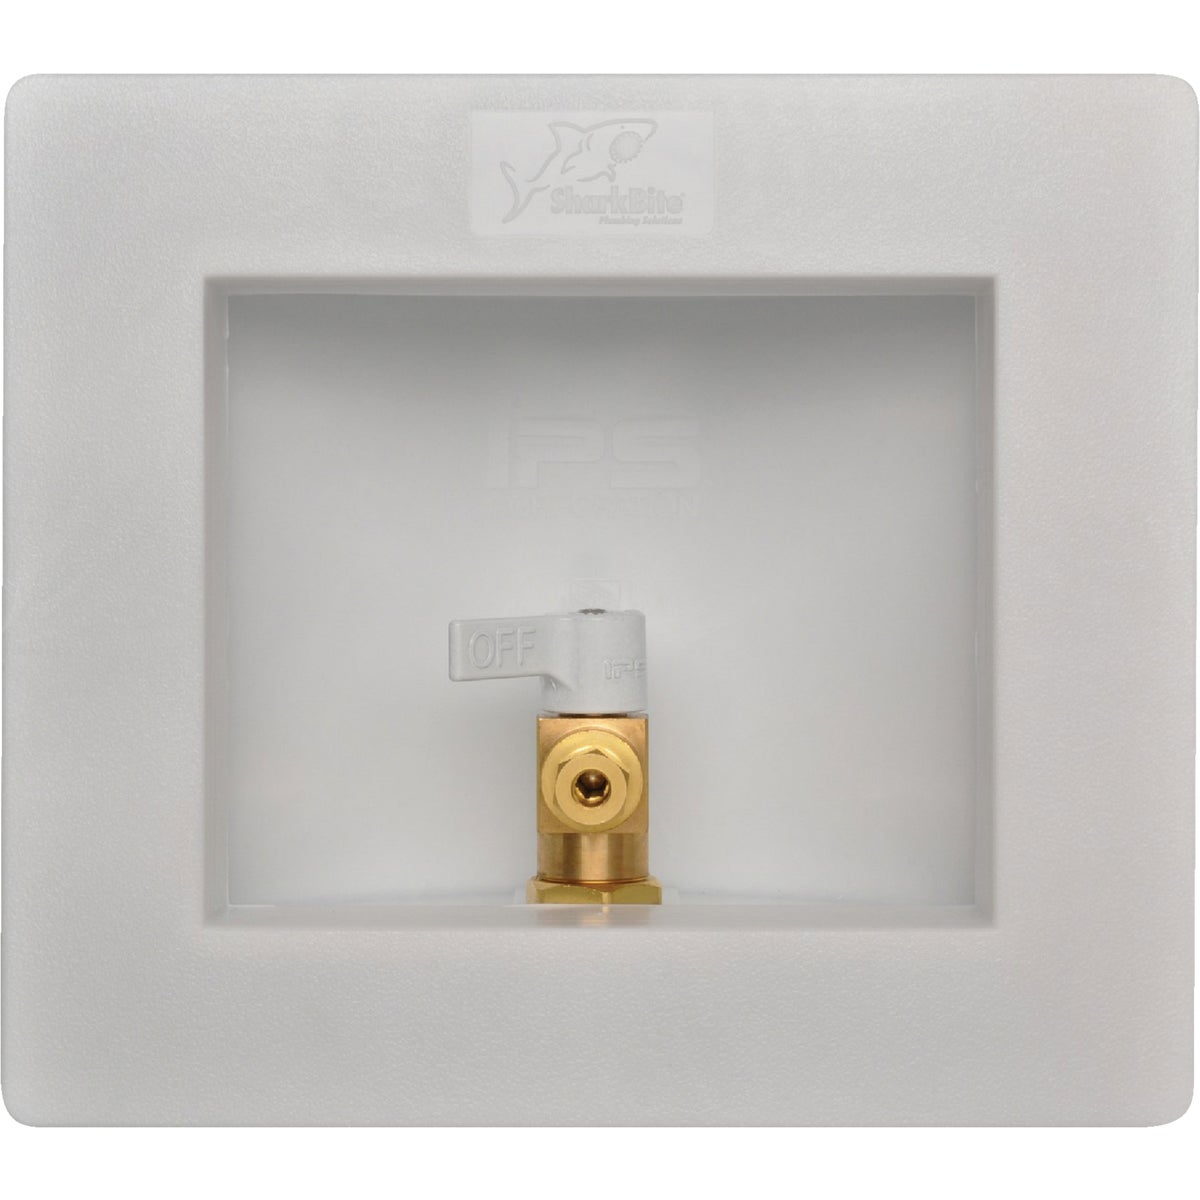 ICE MAKER VALVE & BOX - LFWPIME-1 by Watts Regulator Co